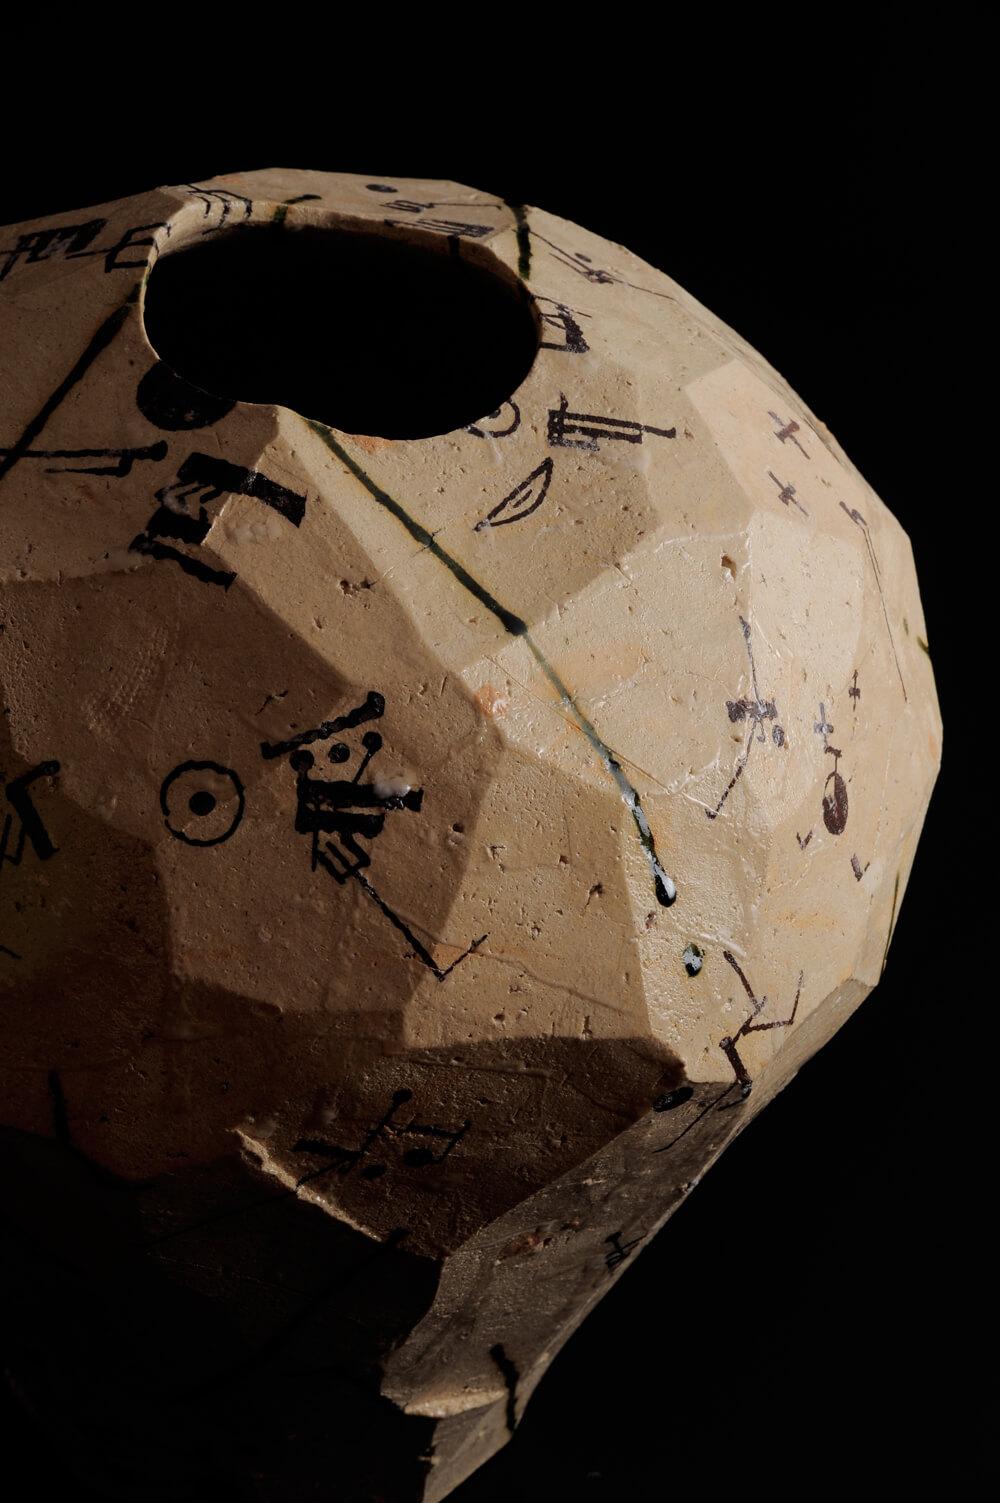 2011年6月25日から開催の「織部考 加藤 亮太郎 陶展」の加藤 亮太郎の作品画像6